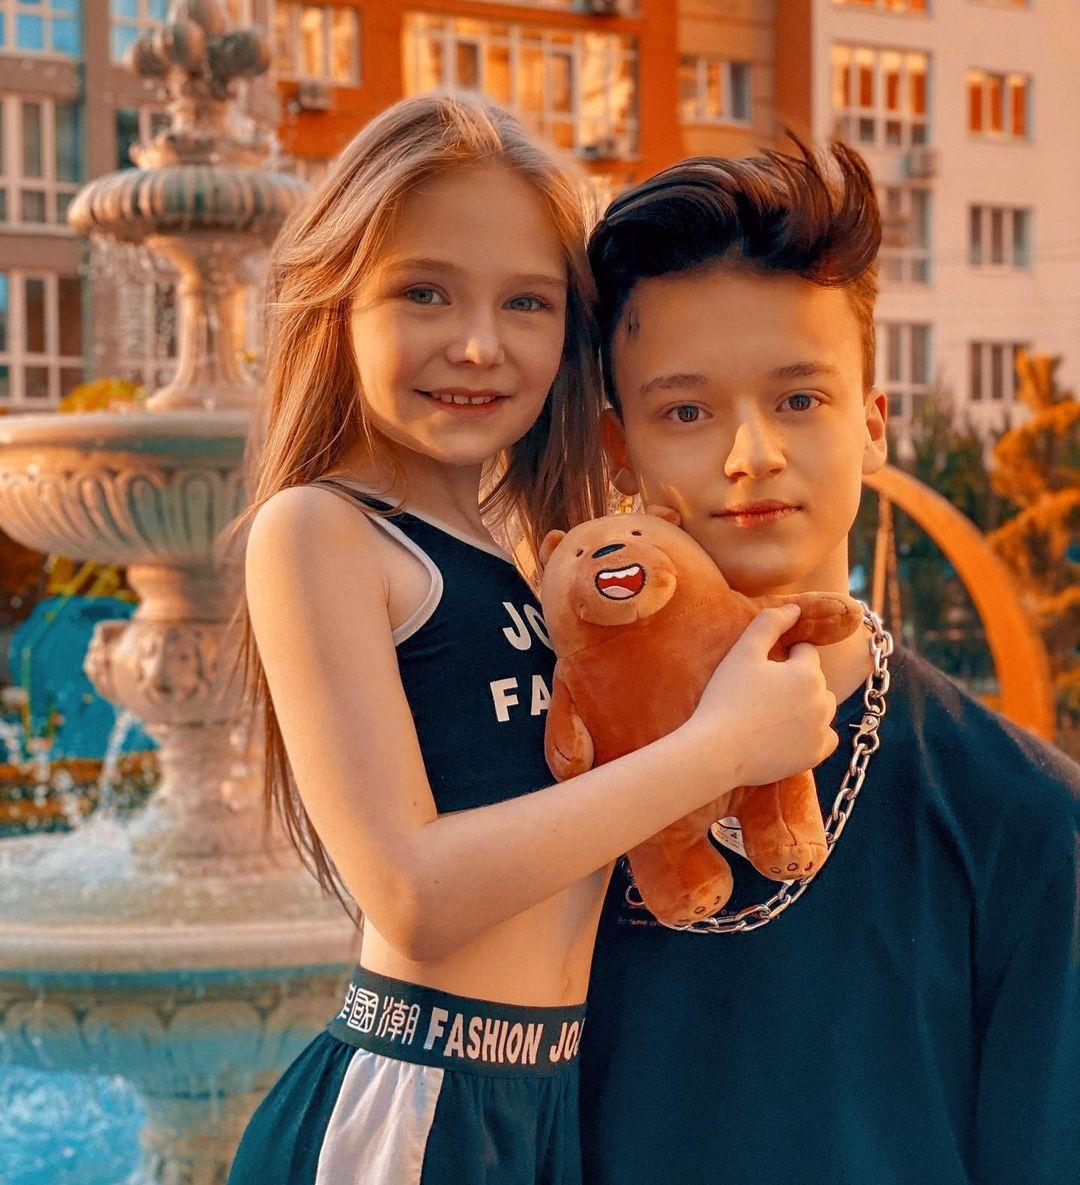 Мілана Маханець та Паша Пай / фото instagram.com/milamaxanets